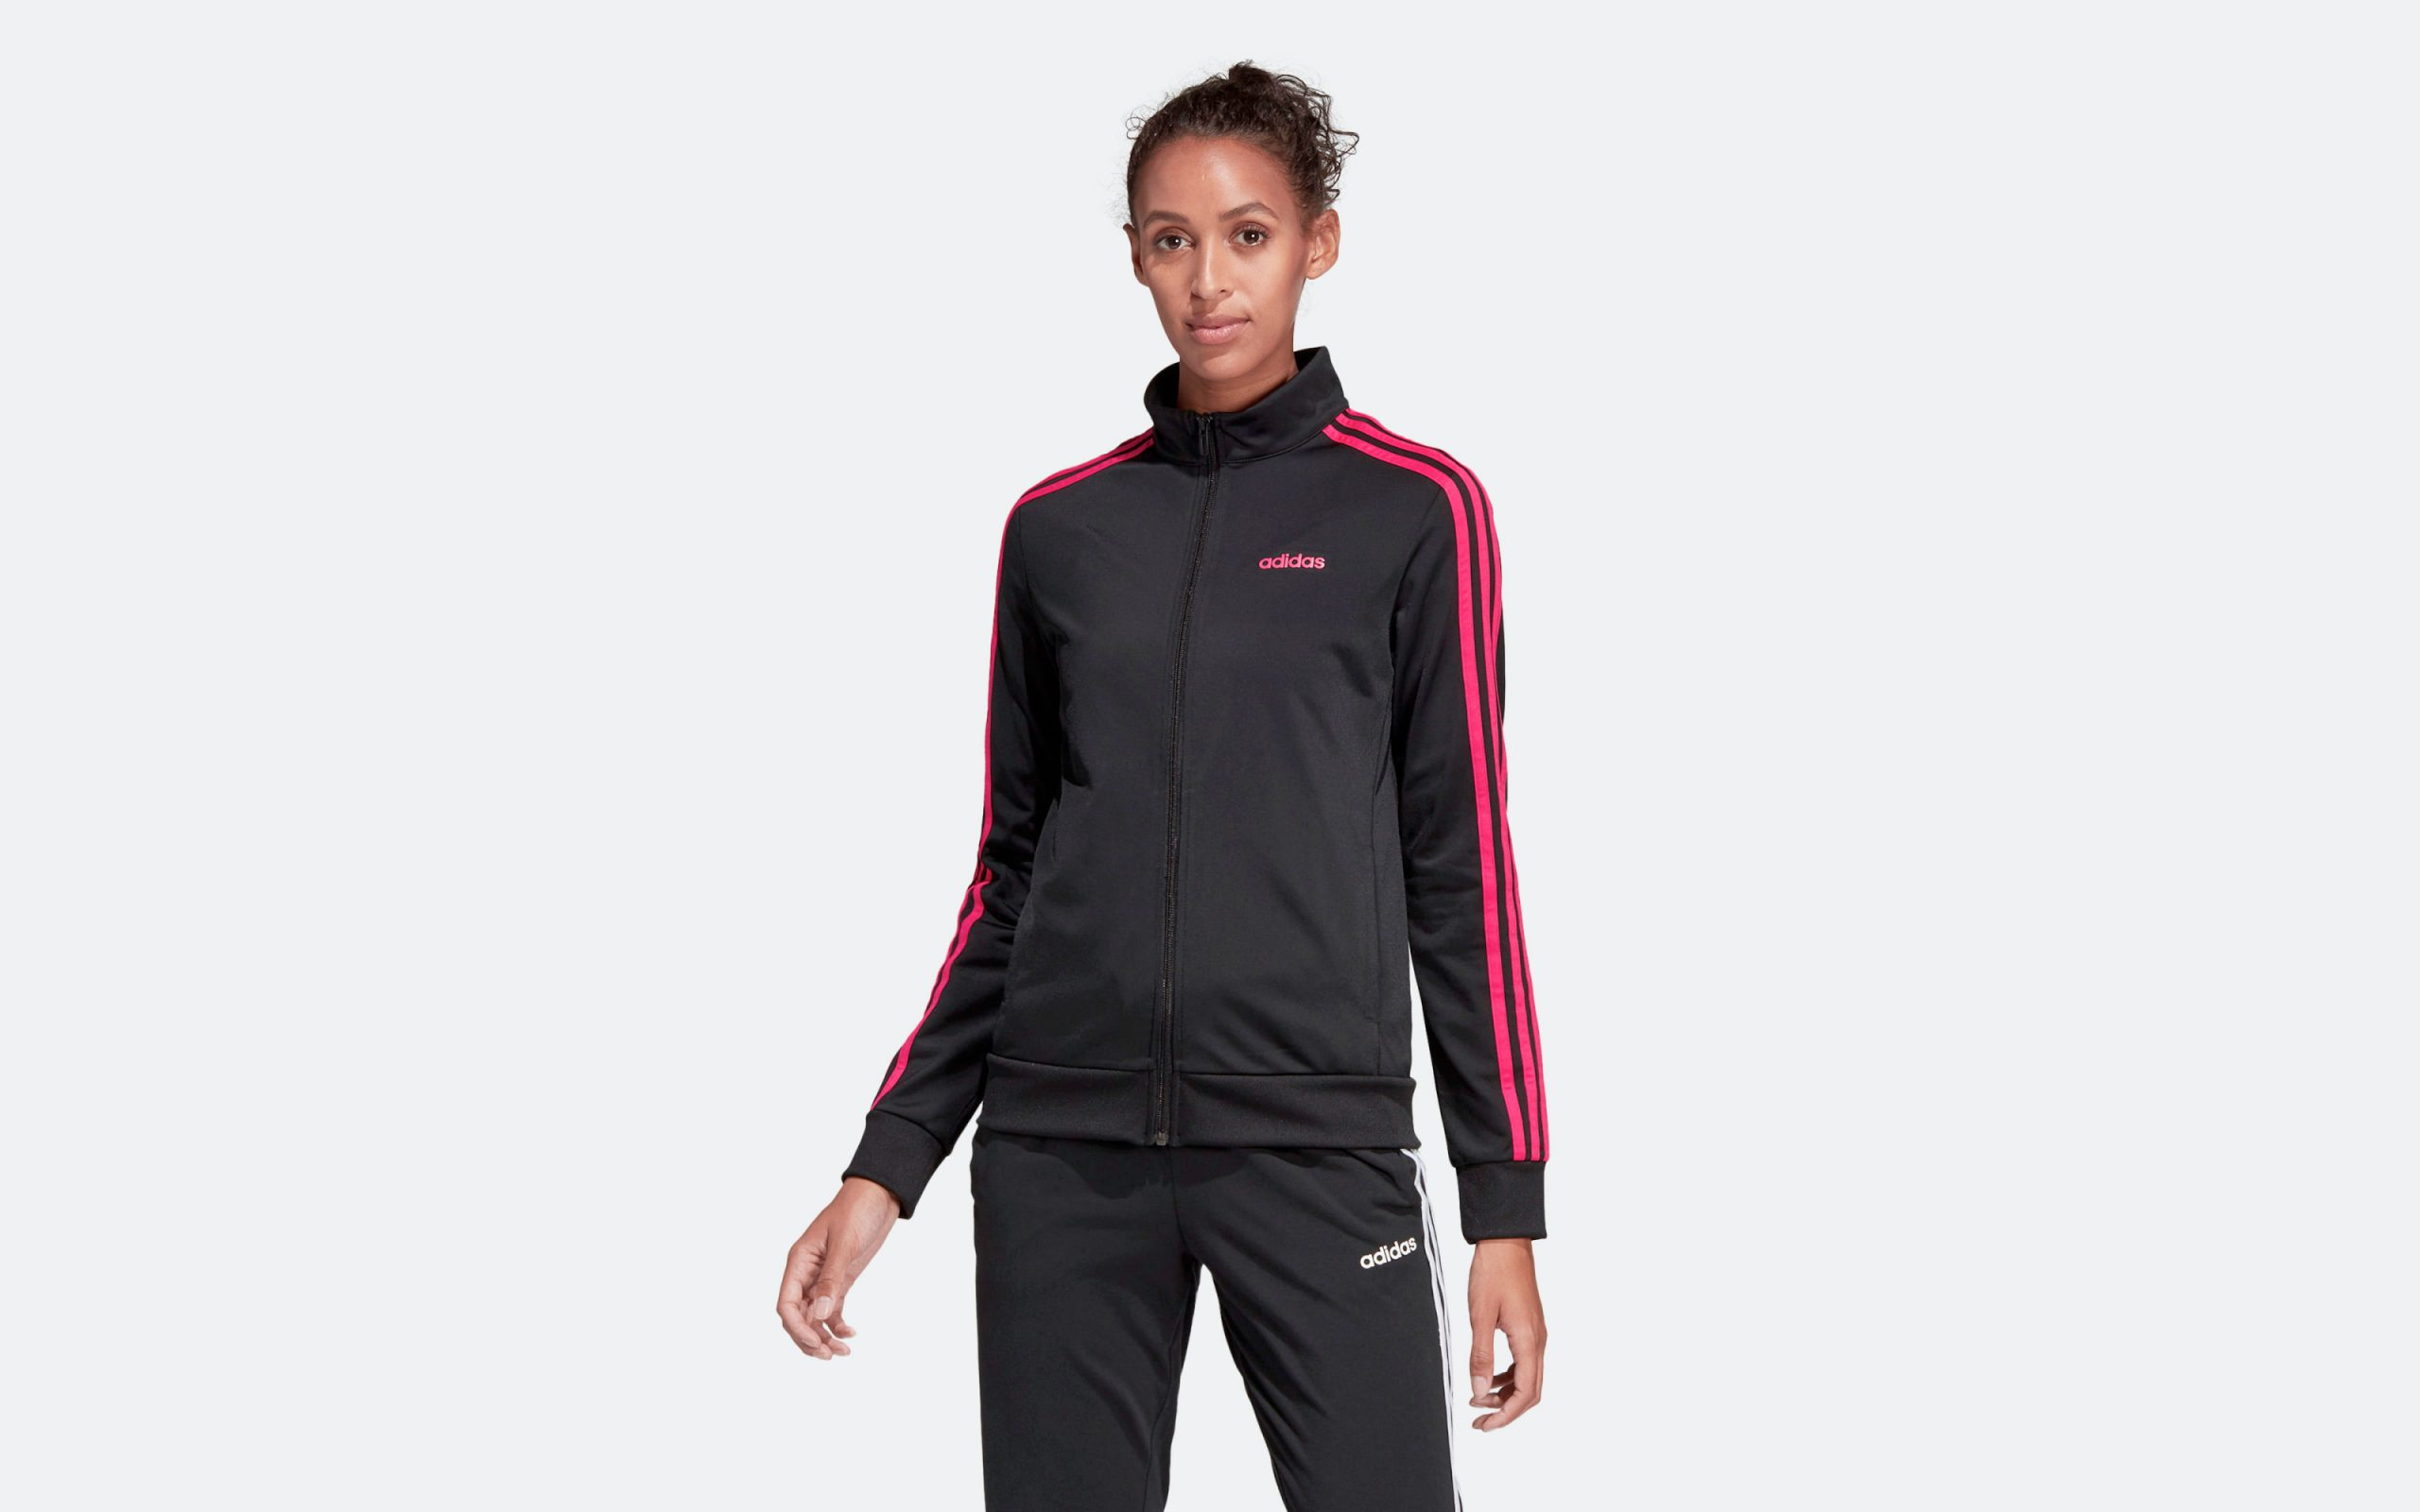 Adidas官網:女裝Track Jacket只賣$25 (免運費)